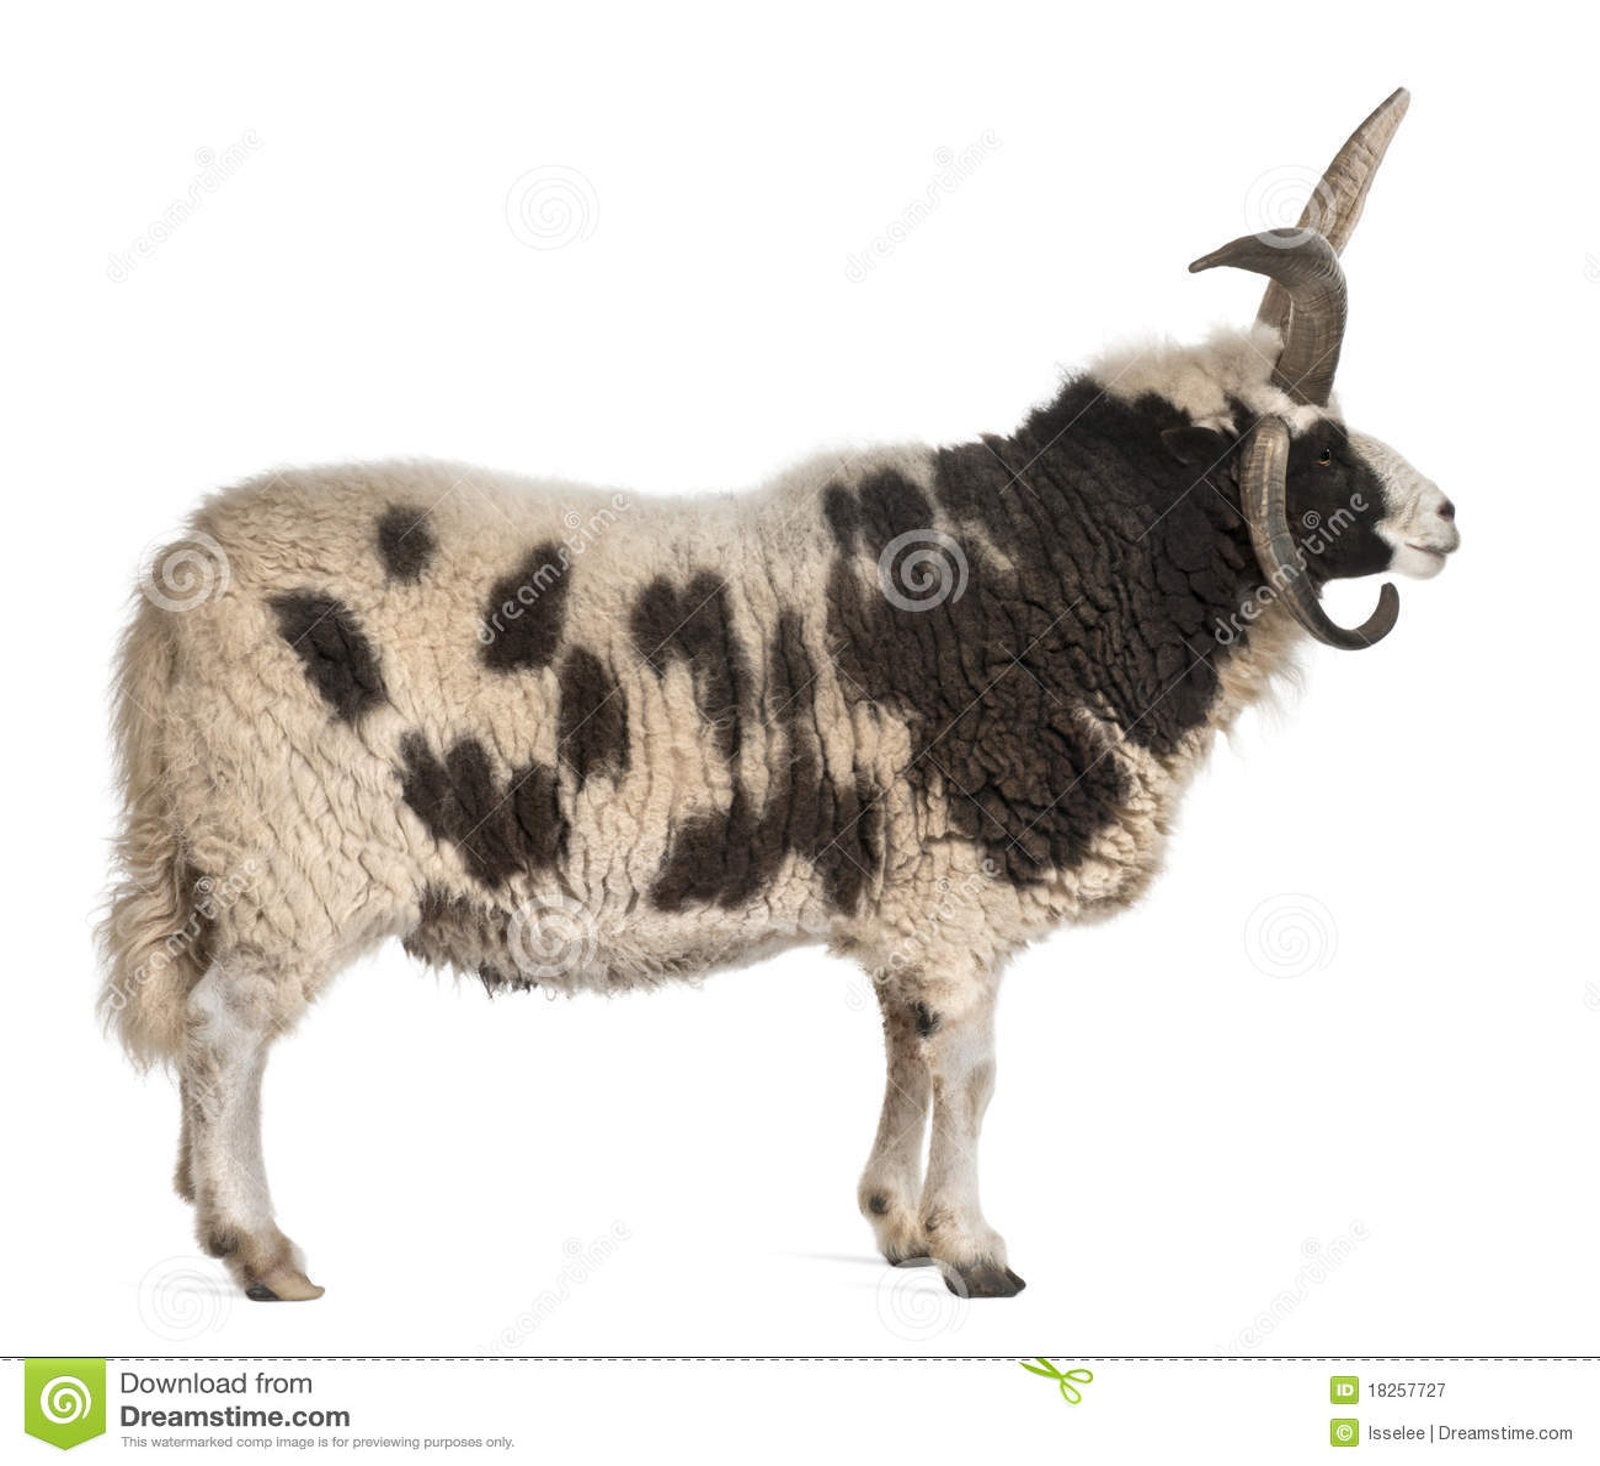 Aries κερασφόρος κριός ovis jacob πολ